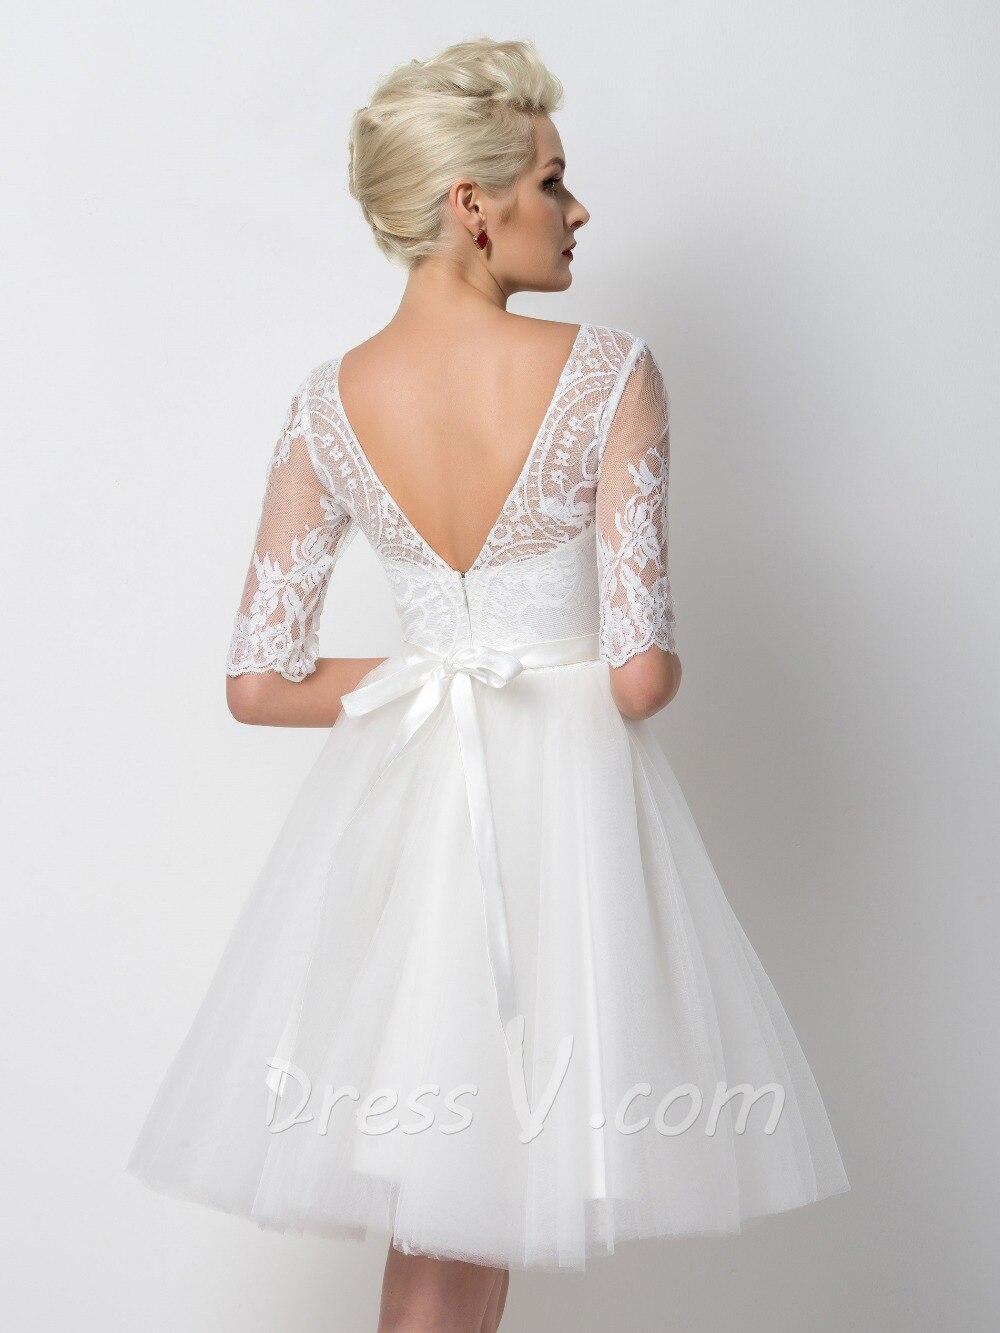 Dressv White Short Cocktail Dresses 2017 Sheer Lace Half Sleeves A ...